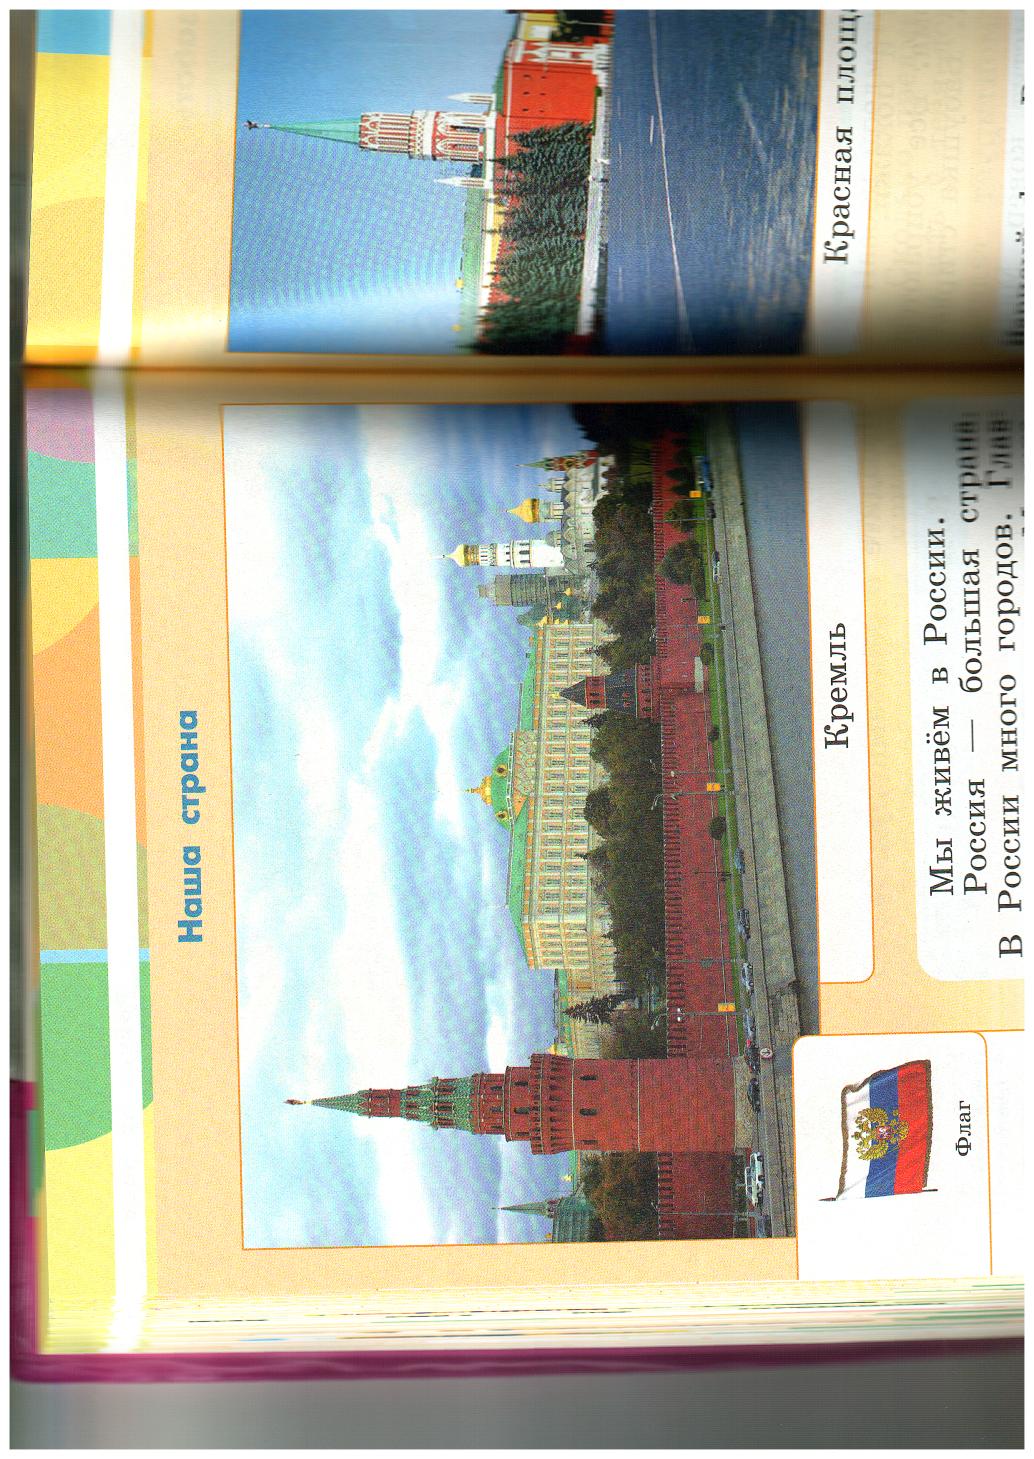 C:\Users\Обертос\Pictures\овощи фрукты\2014-11-19 куб\куб 010.BMP